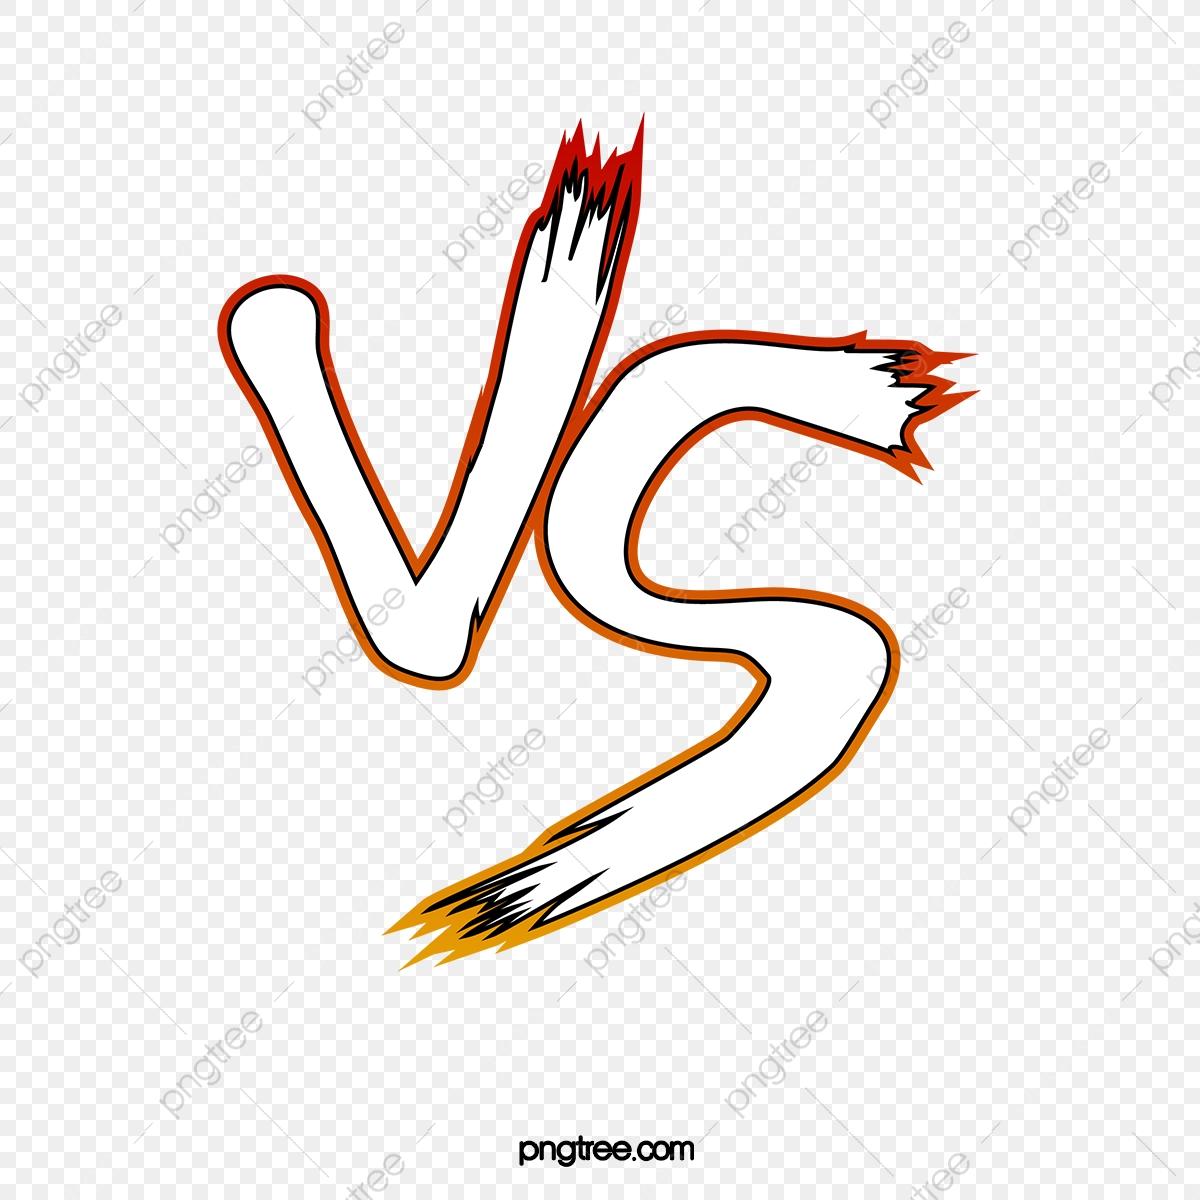 Vs Showdown, Vs Calligraphy, Pk Duel, Vs PNG Transparent Clipart.